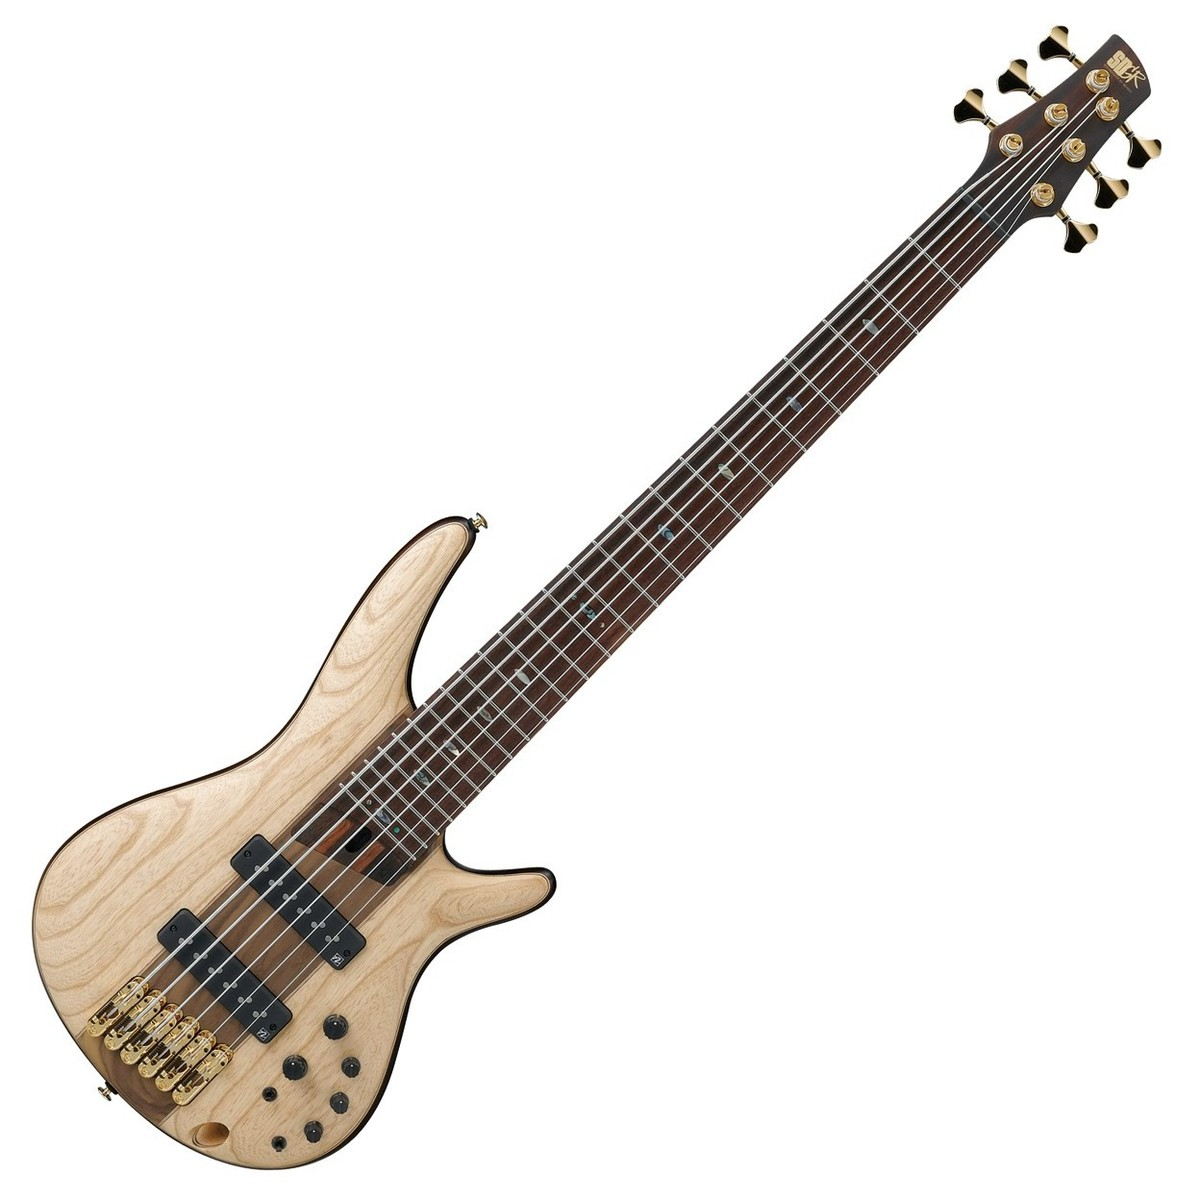 ibanez sr1306 premium 6 string bass 2018 natural flat at gear4music. Black Bedroom Furniture Sets. Home Design Ideas